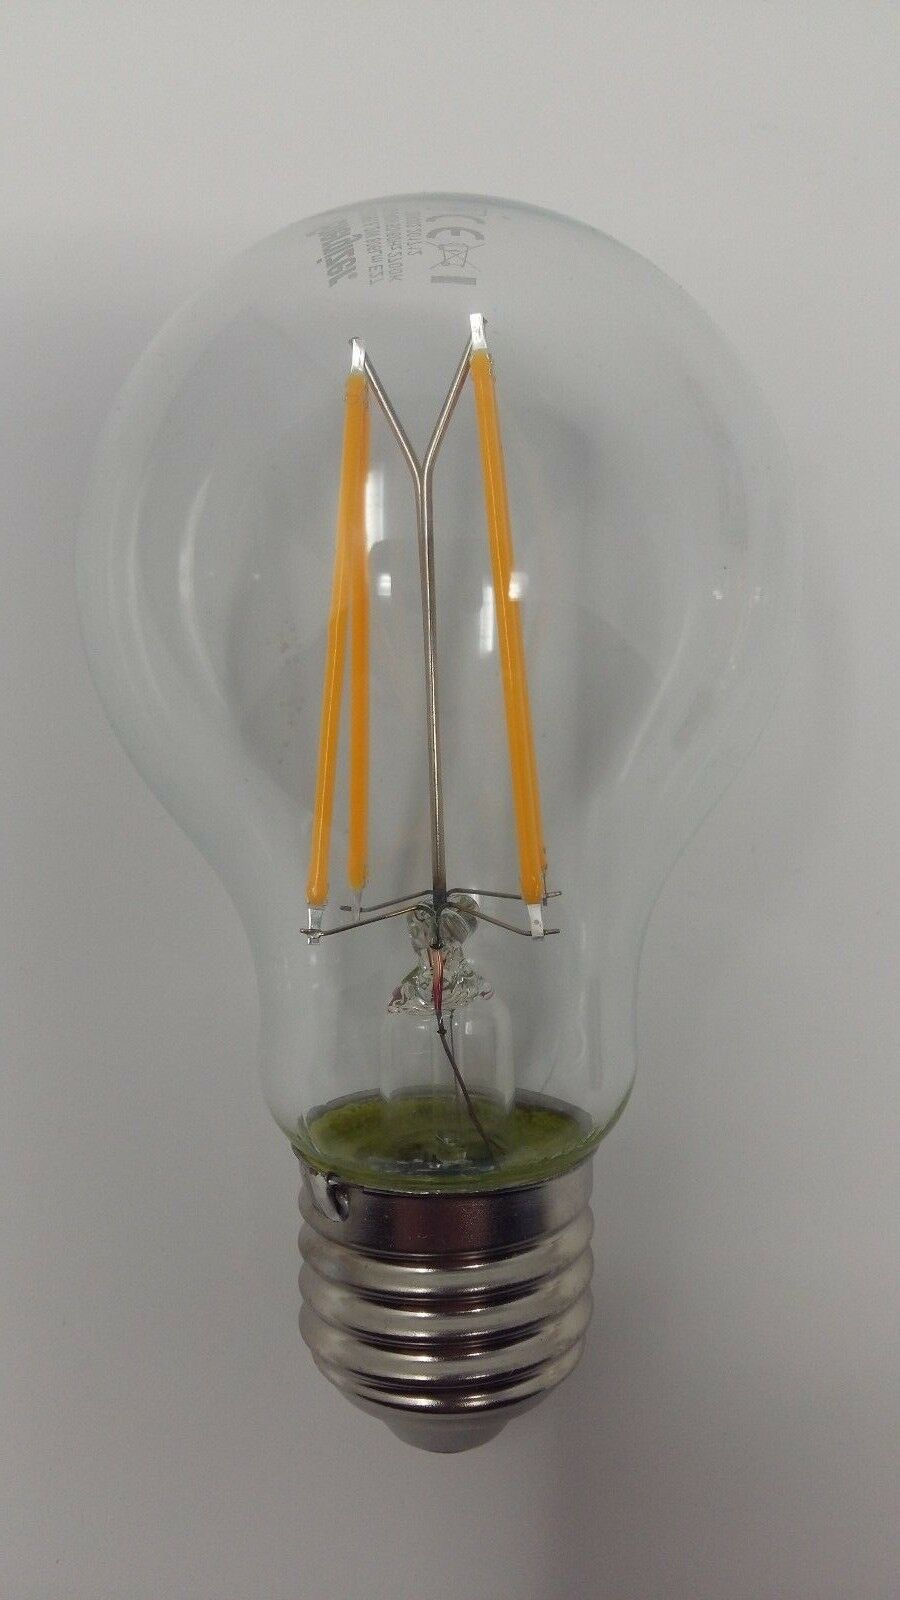 4.2w 6.2w 8w GLS Bombillas de filamento LED Energizer es tornillo en E27 40w 60w 75w